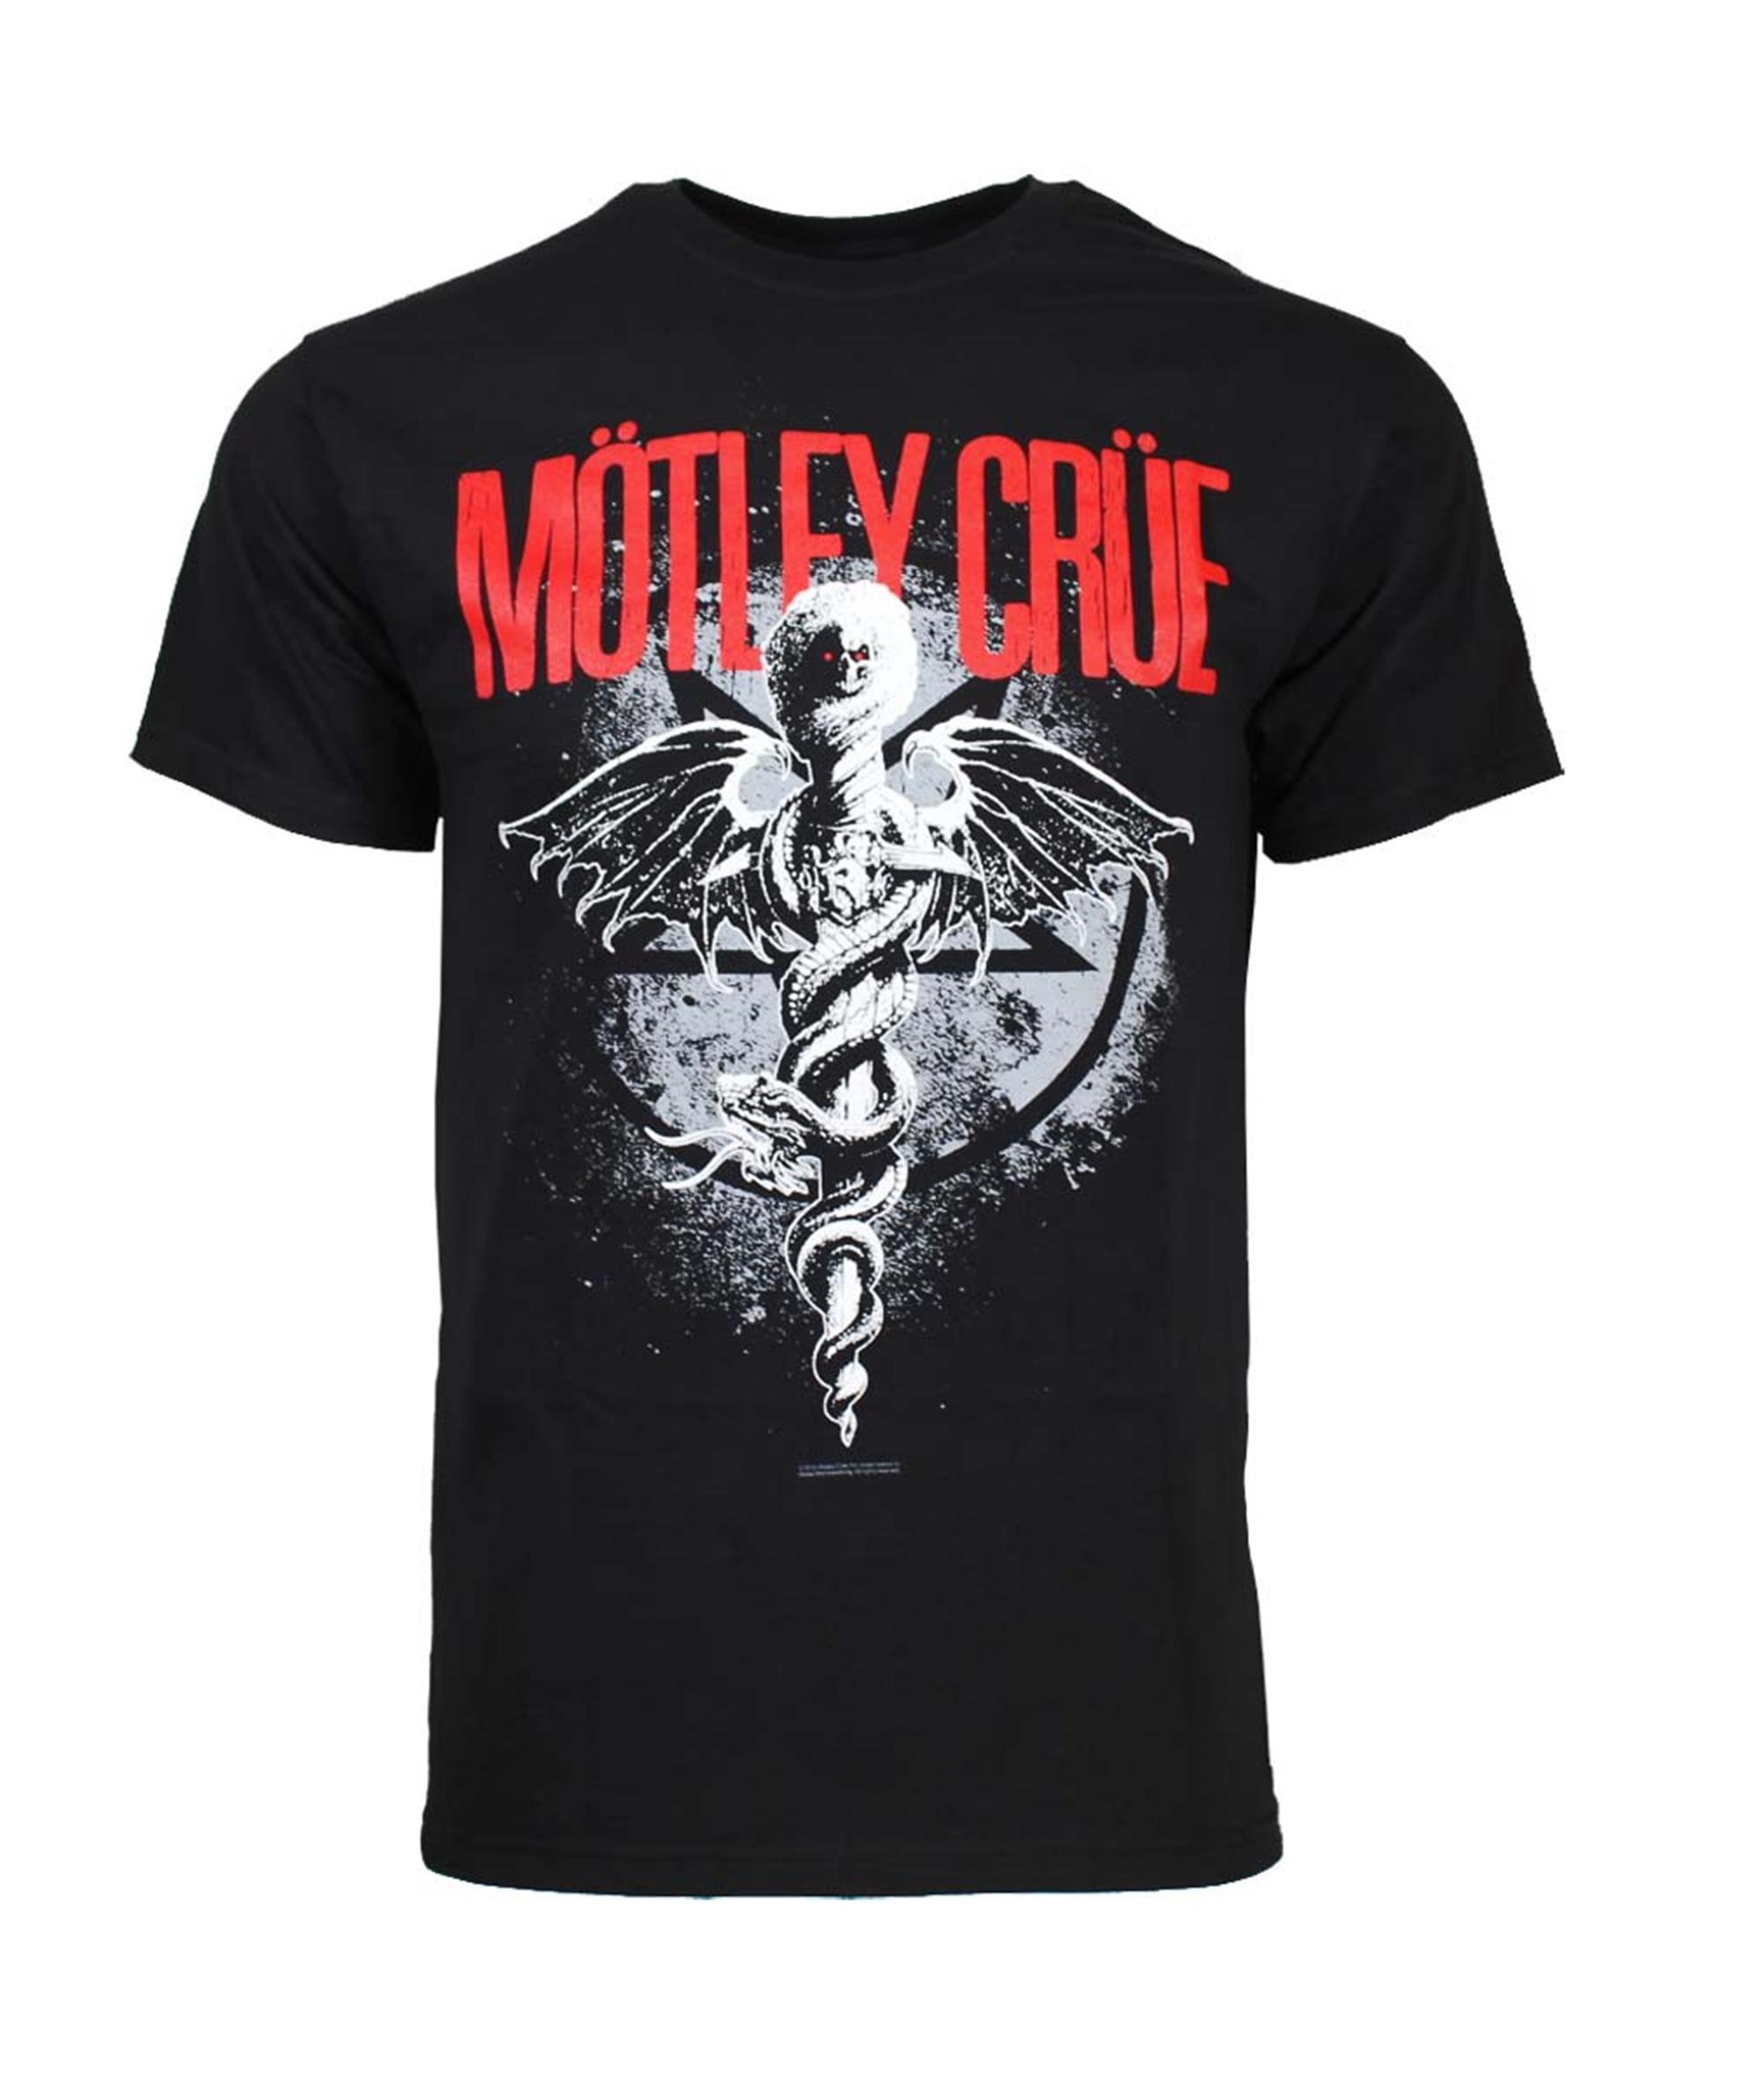 Motley Crue Dr. Feelgood T-Shirt